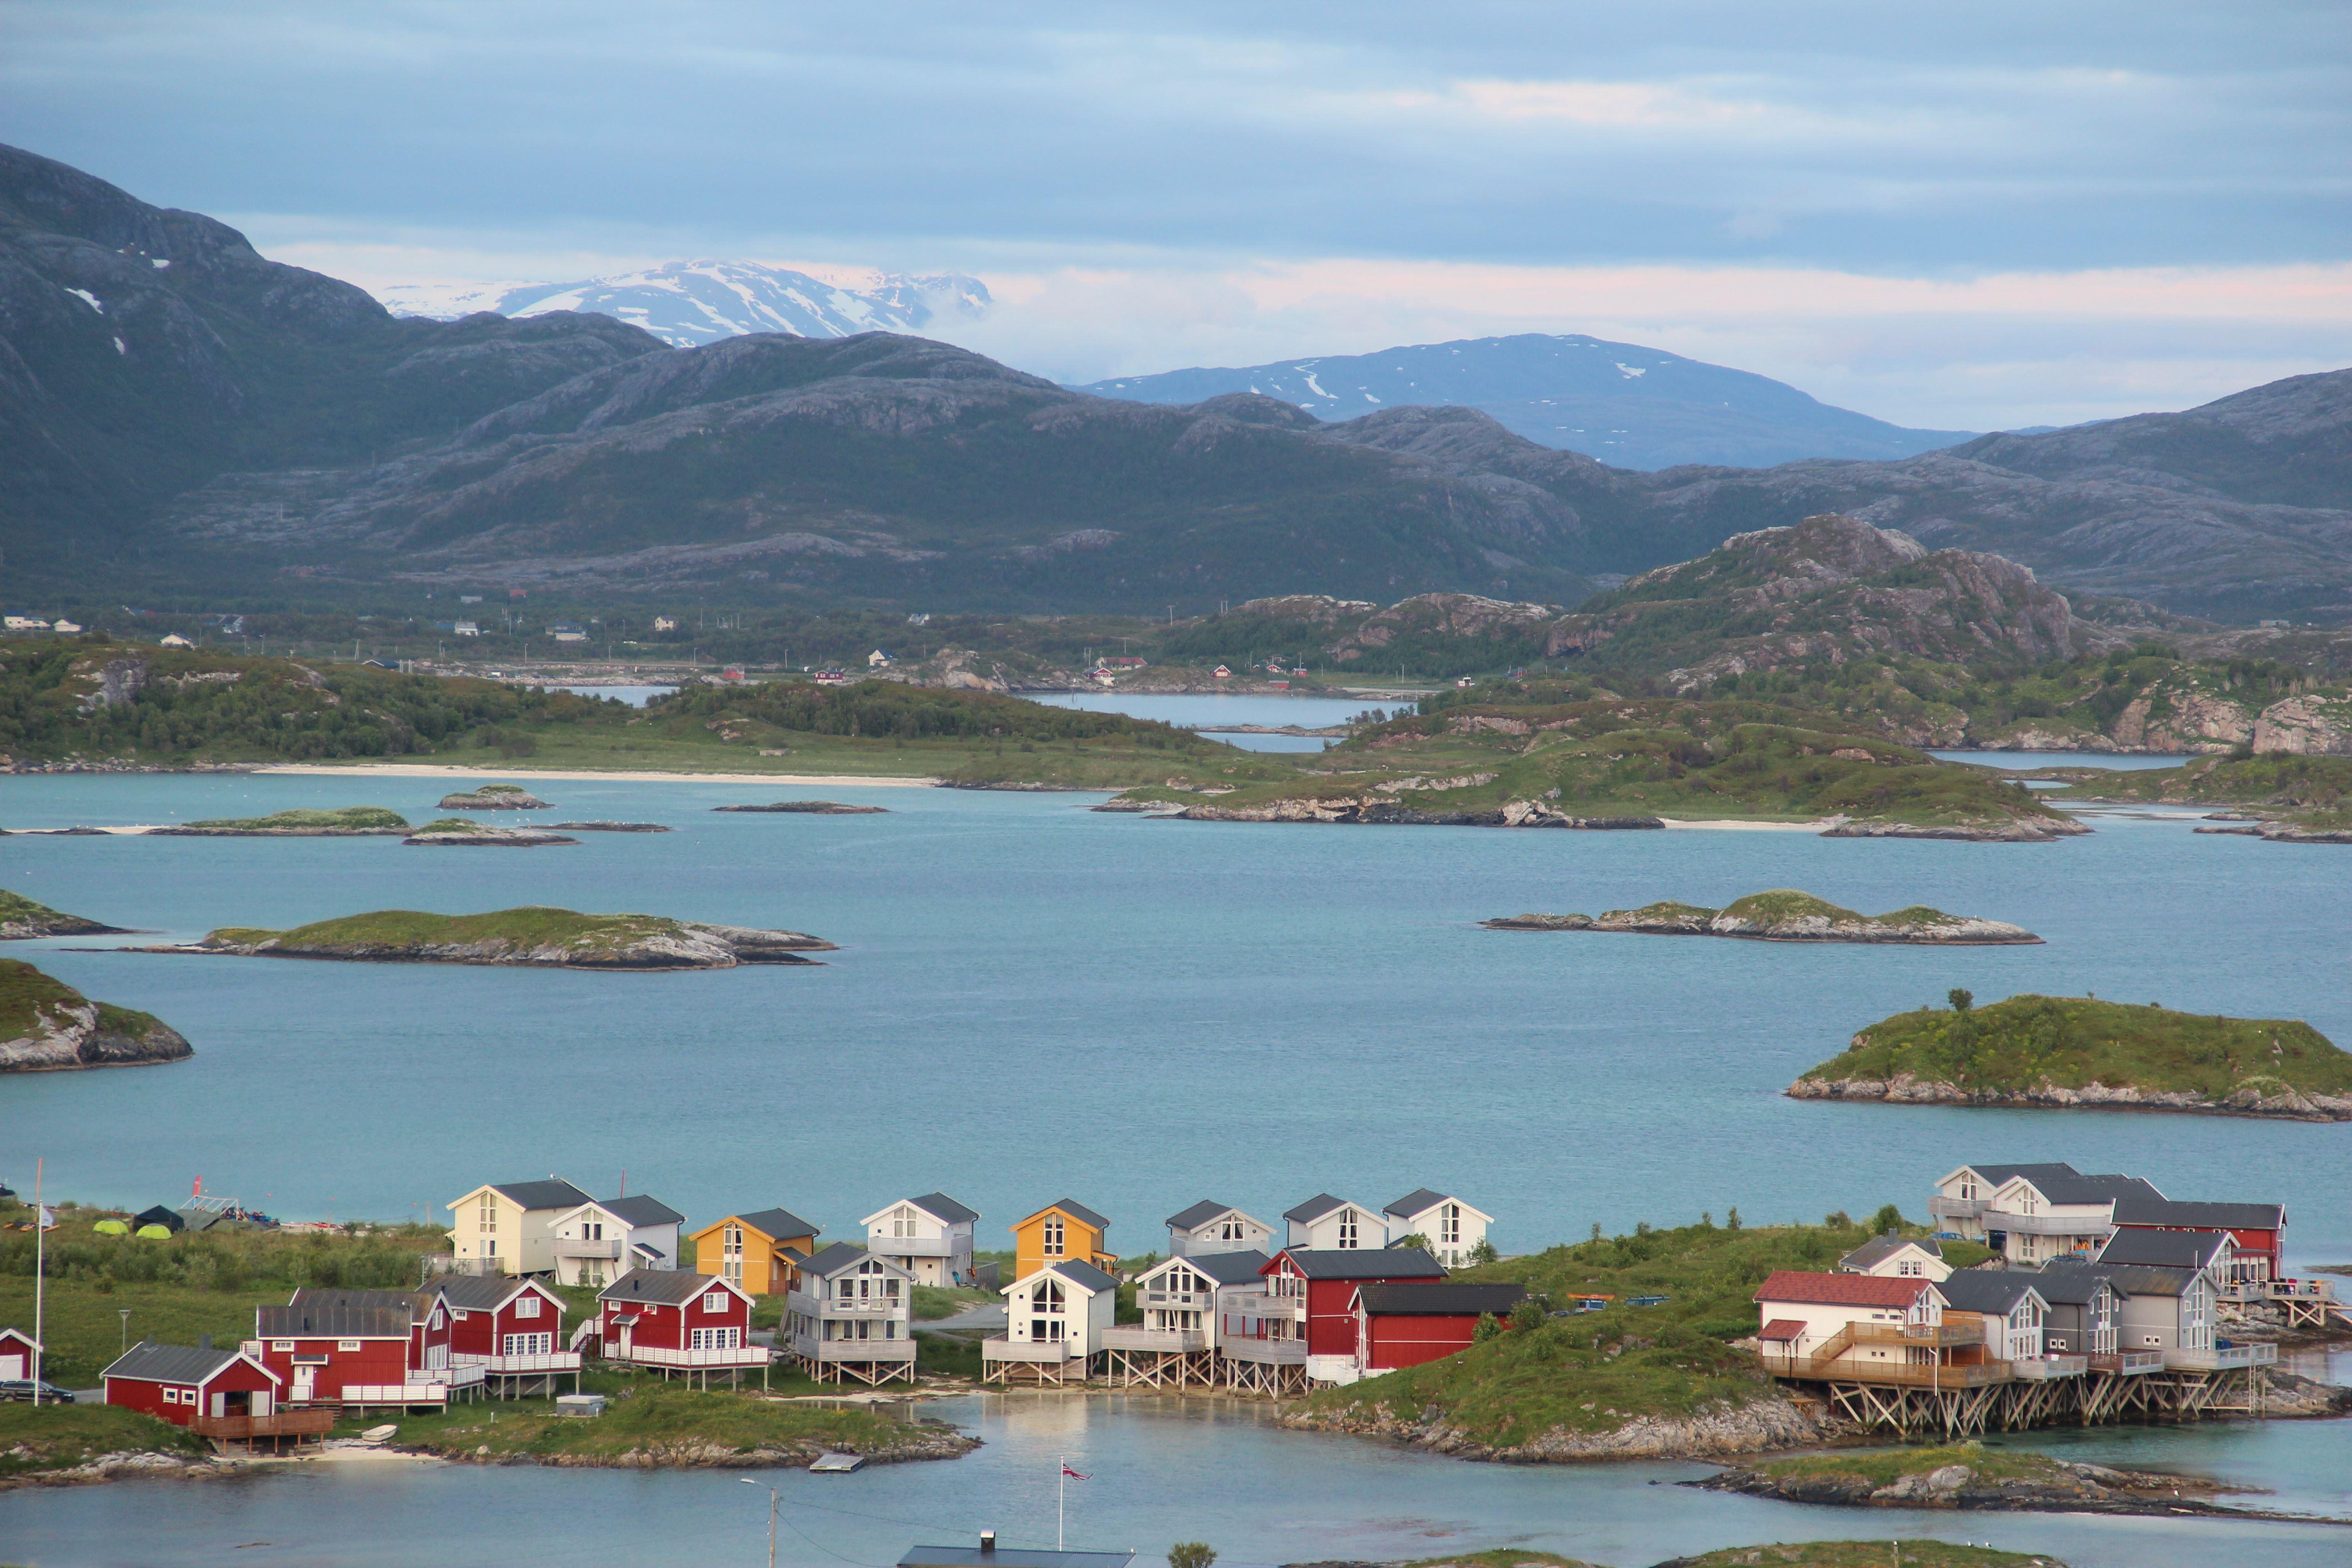 Fjordtur til Sommarøy, alternativt Grøtfjord - Flexitour